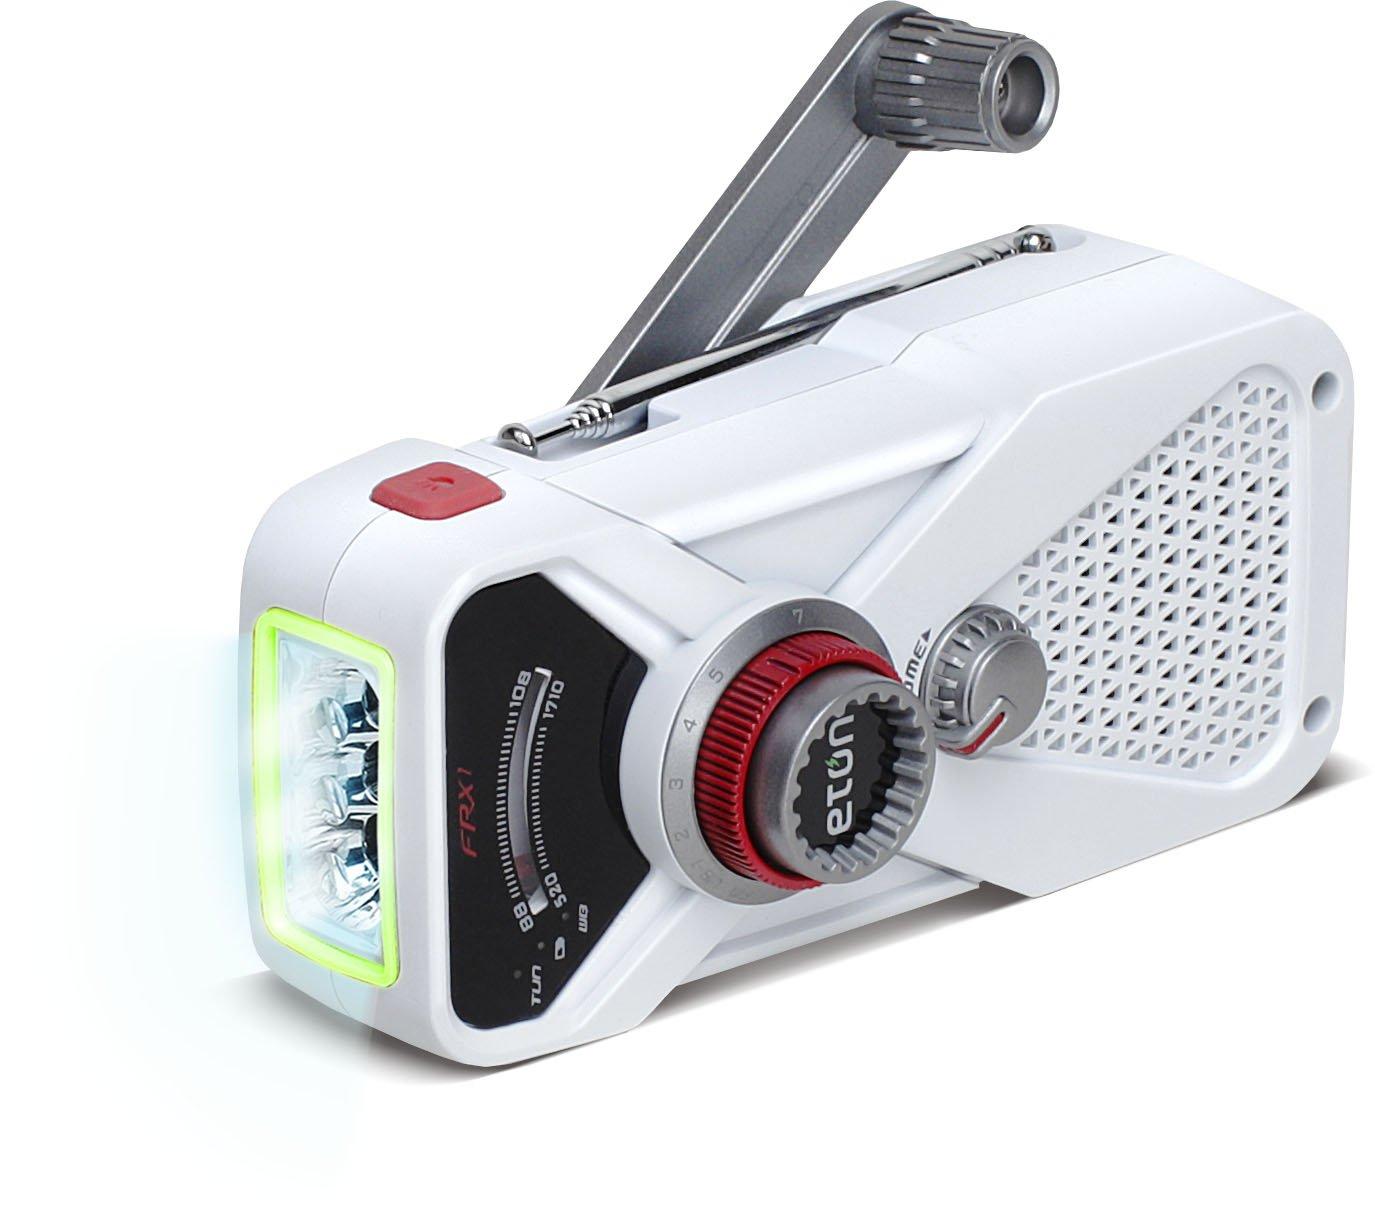 Eton FRX1 Personal Analógica Blanco - Radio (Personal, Analógica, AM,FM, USB, Blanco, De plástico): Amazon.es: Electrónica